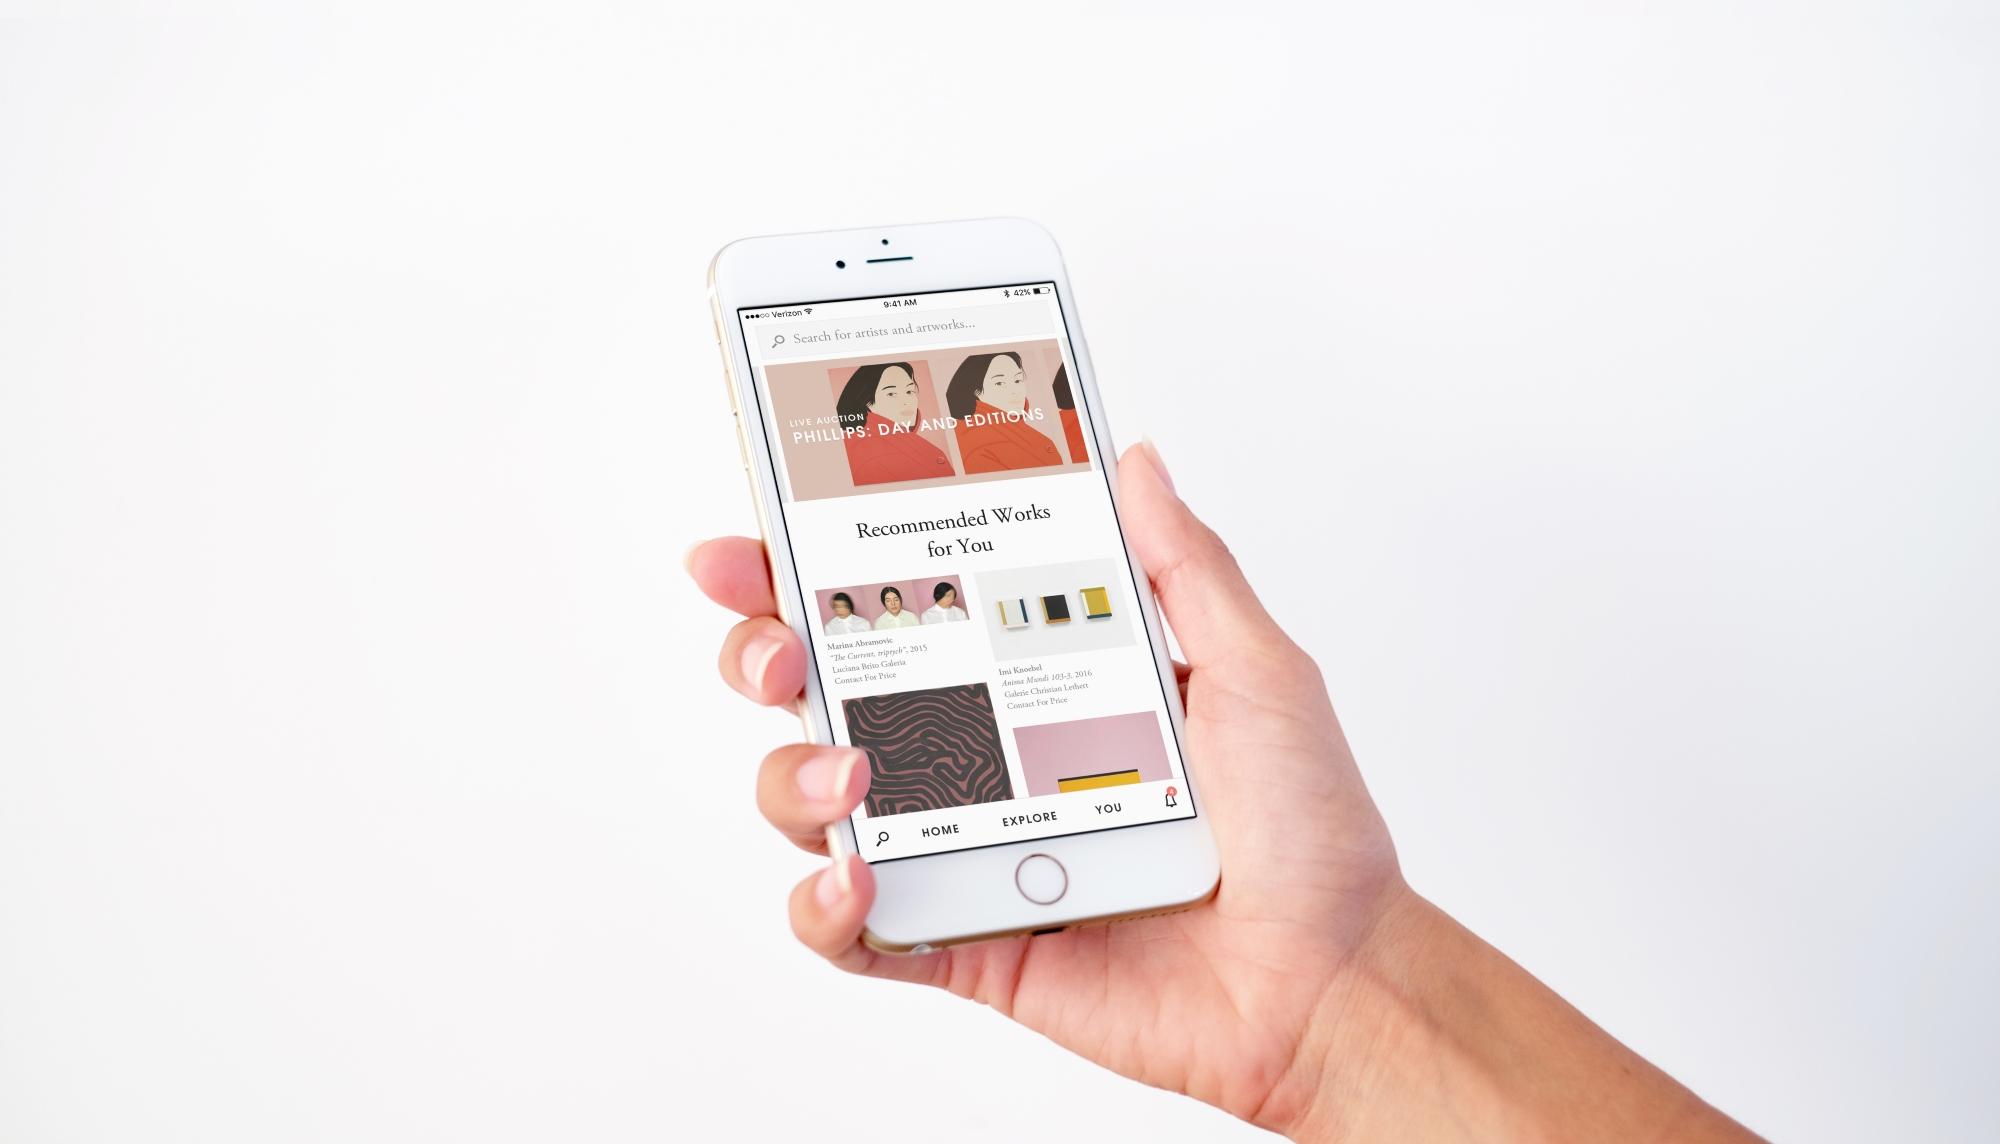 Artsy.net su smartphone